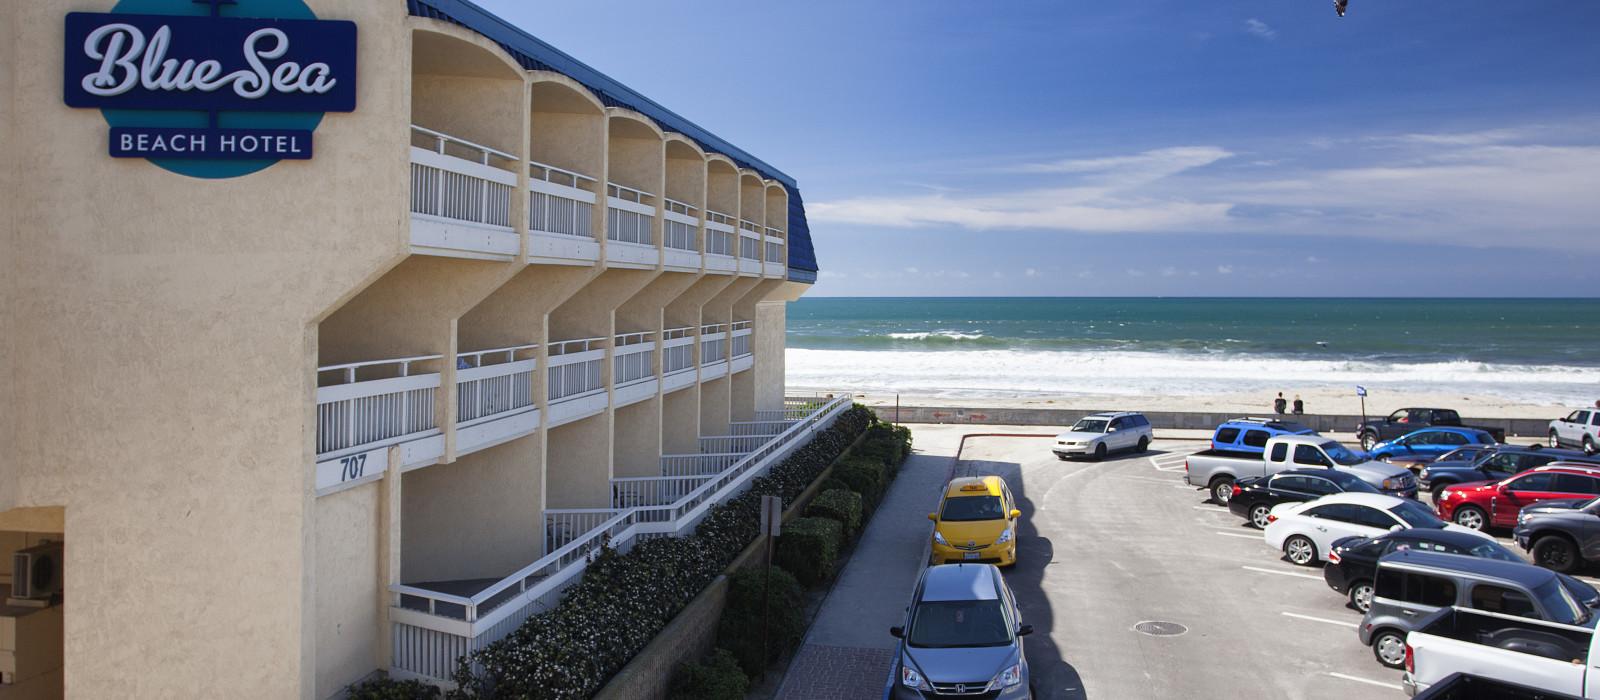 Hotel Blue Sea Beach  USA